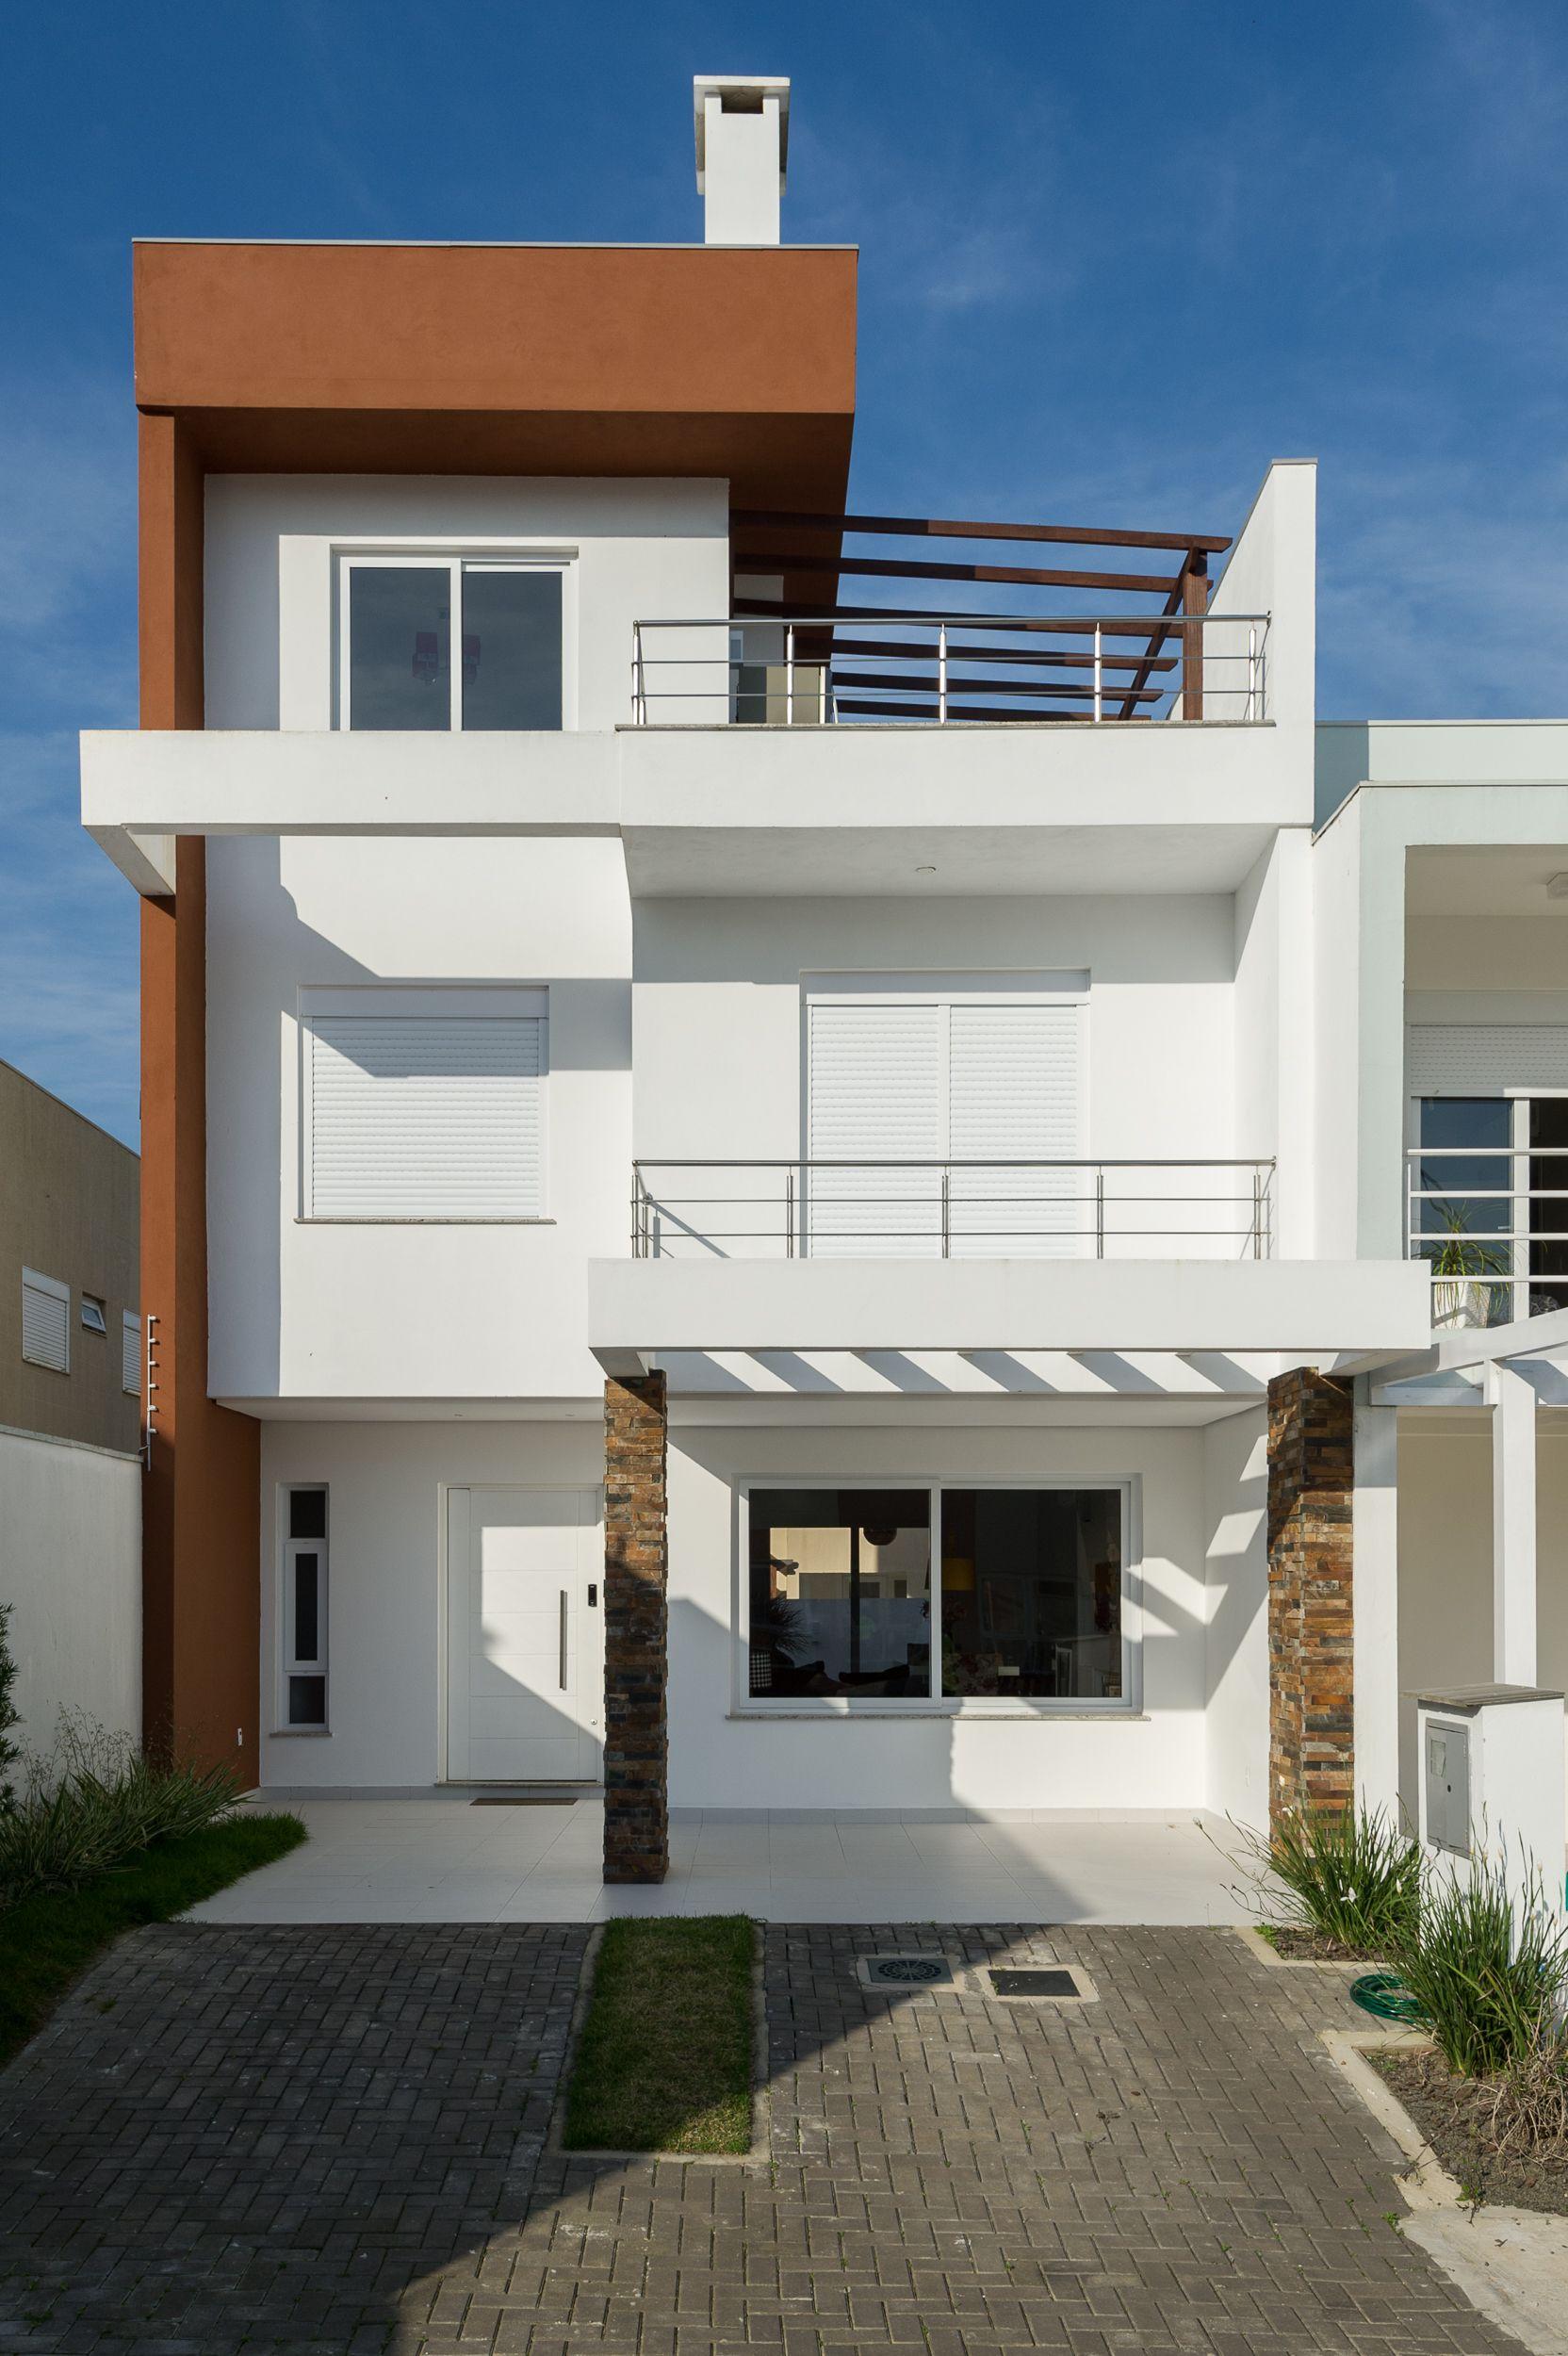 Modern House Bungalow Exterior By Ar Sagar Morkhade Vdraw Architecture 91 8793196382: House Styles, Home Decor, Garage Doors